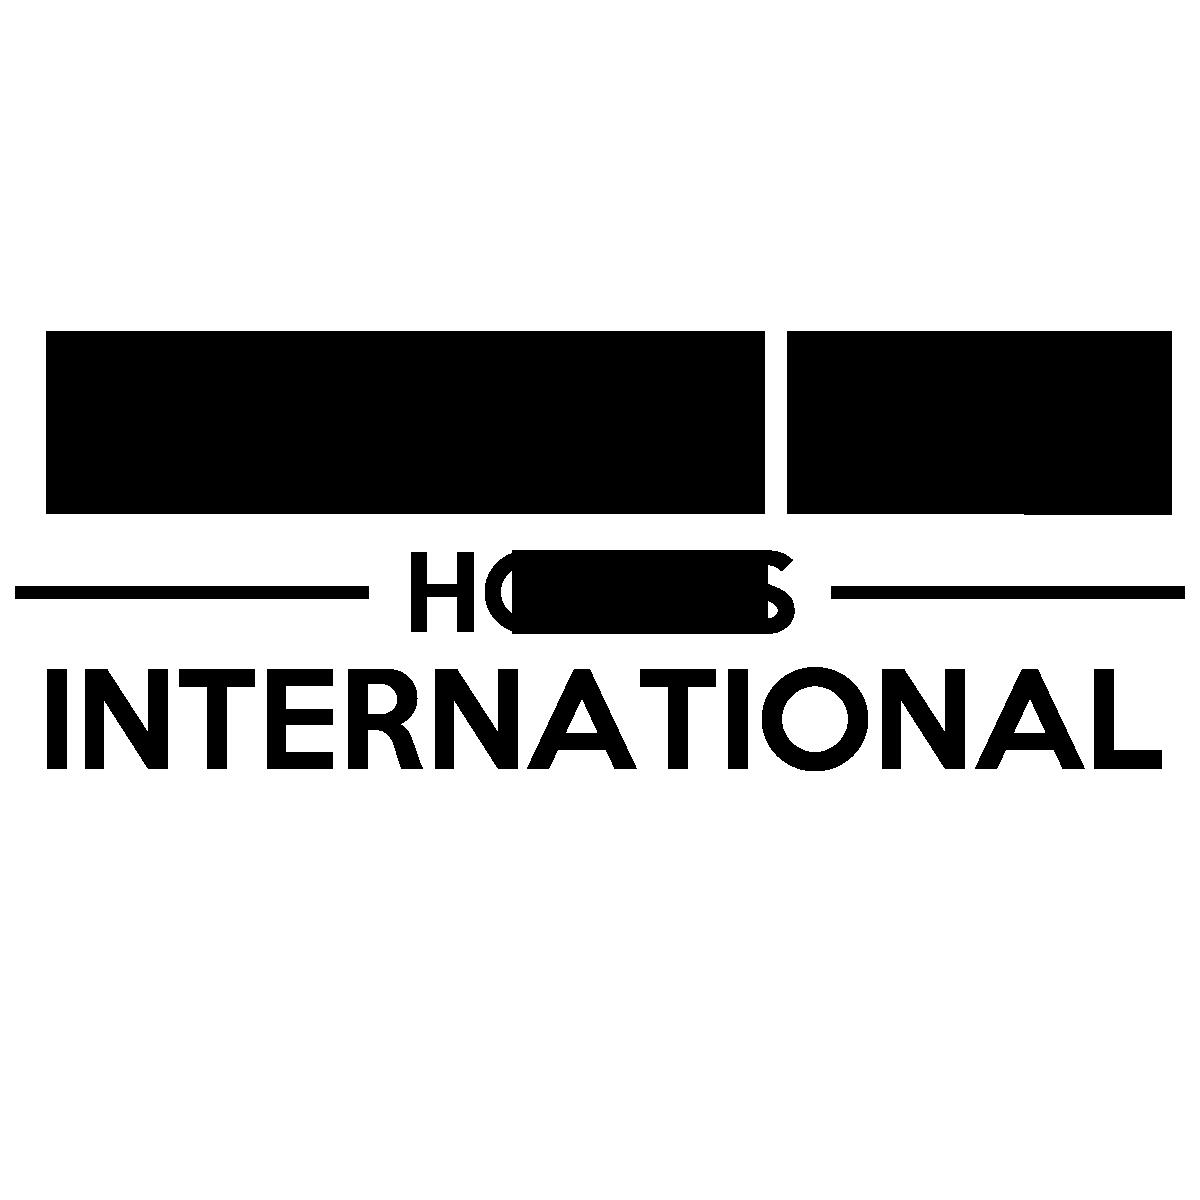 IdentityHoopsInternational-01.png